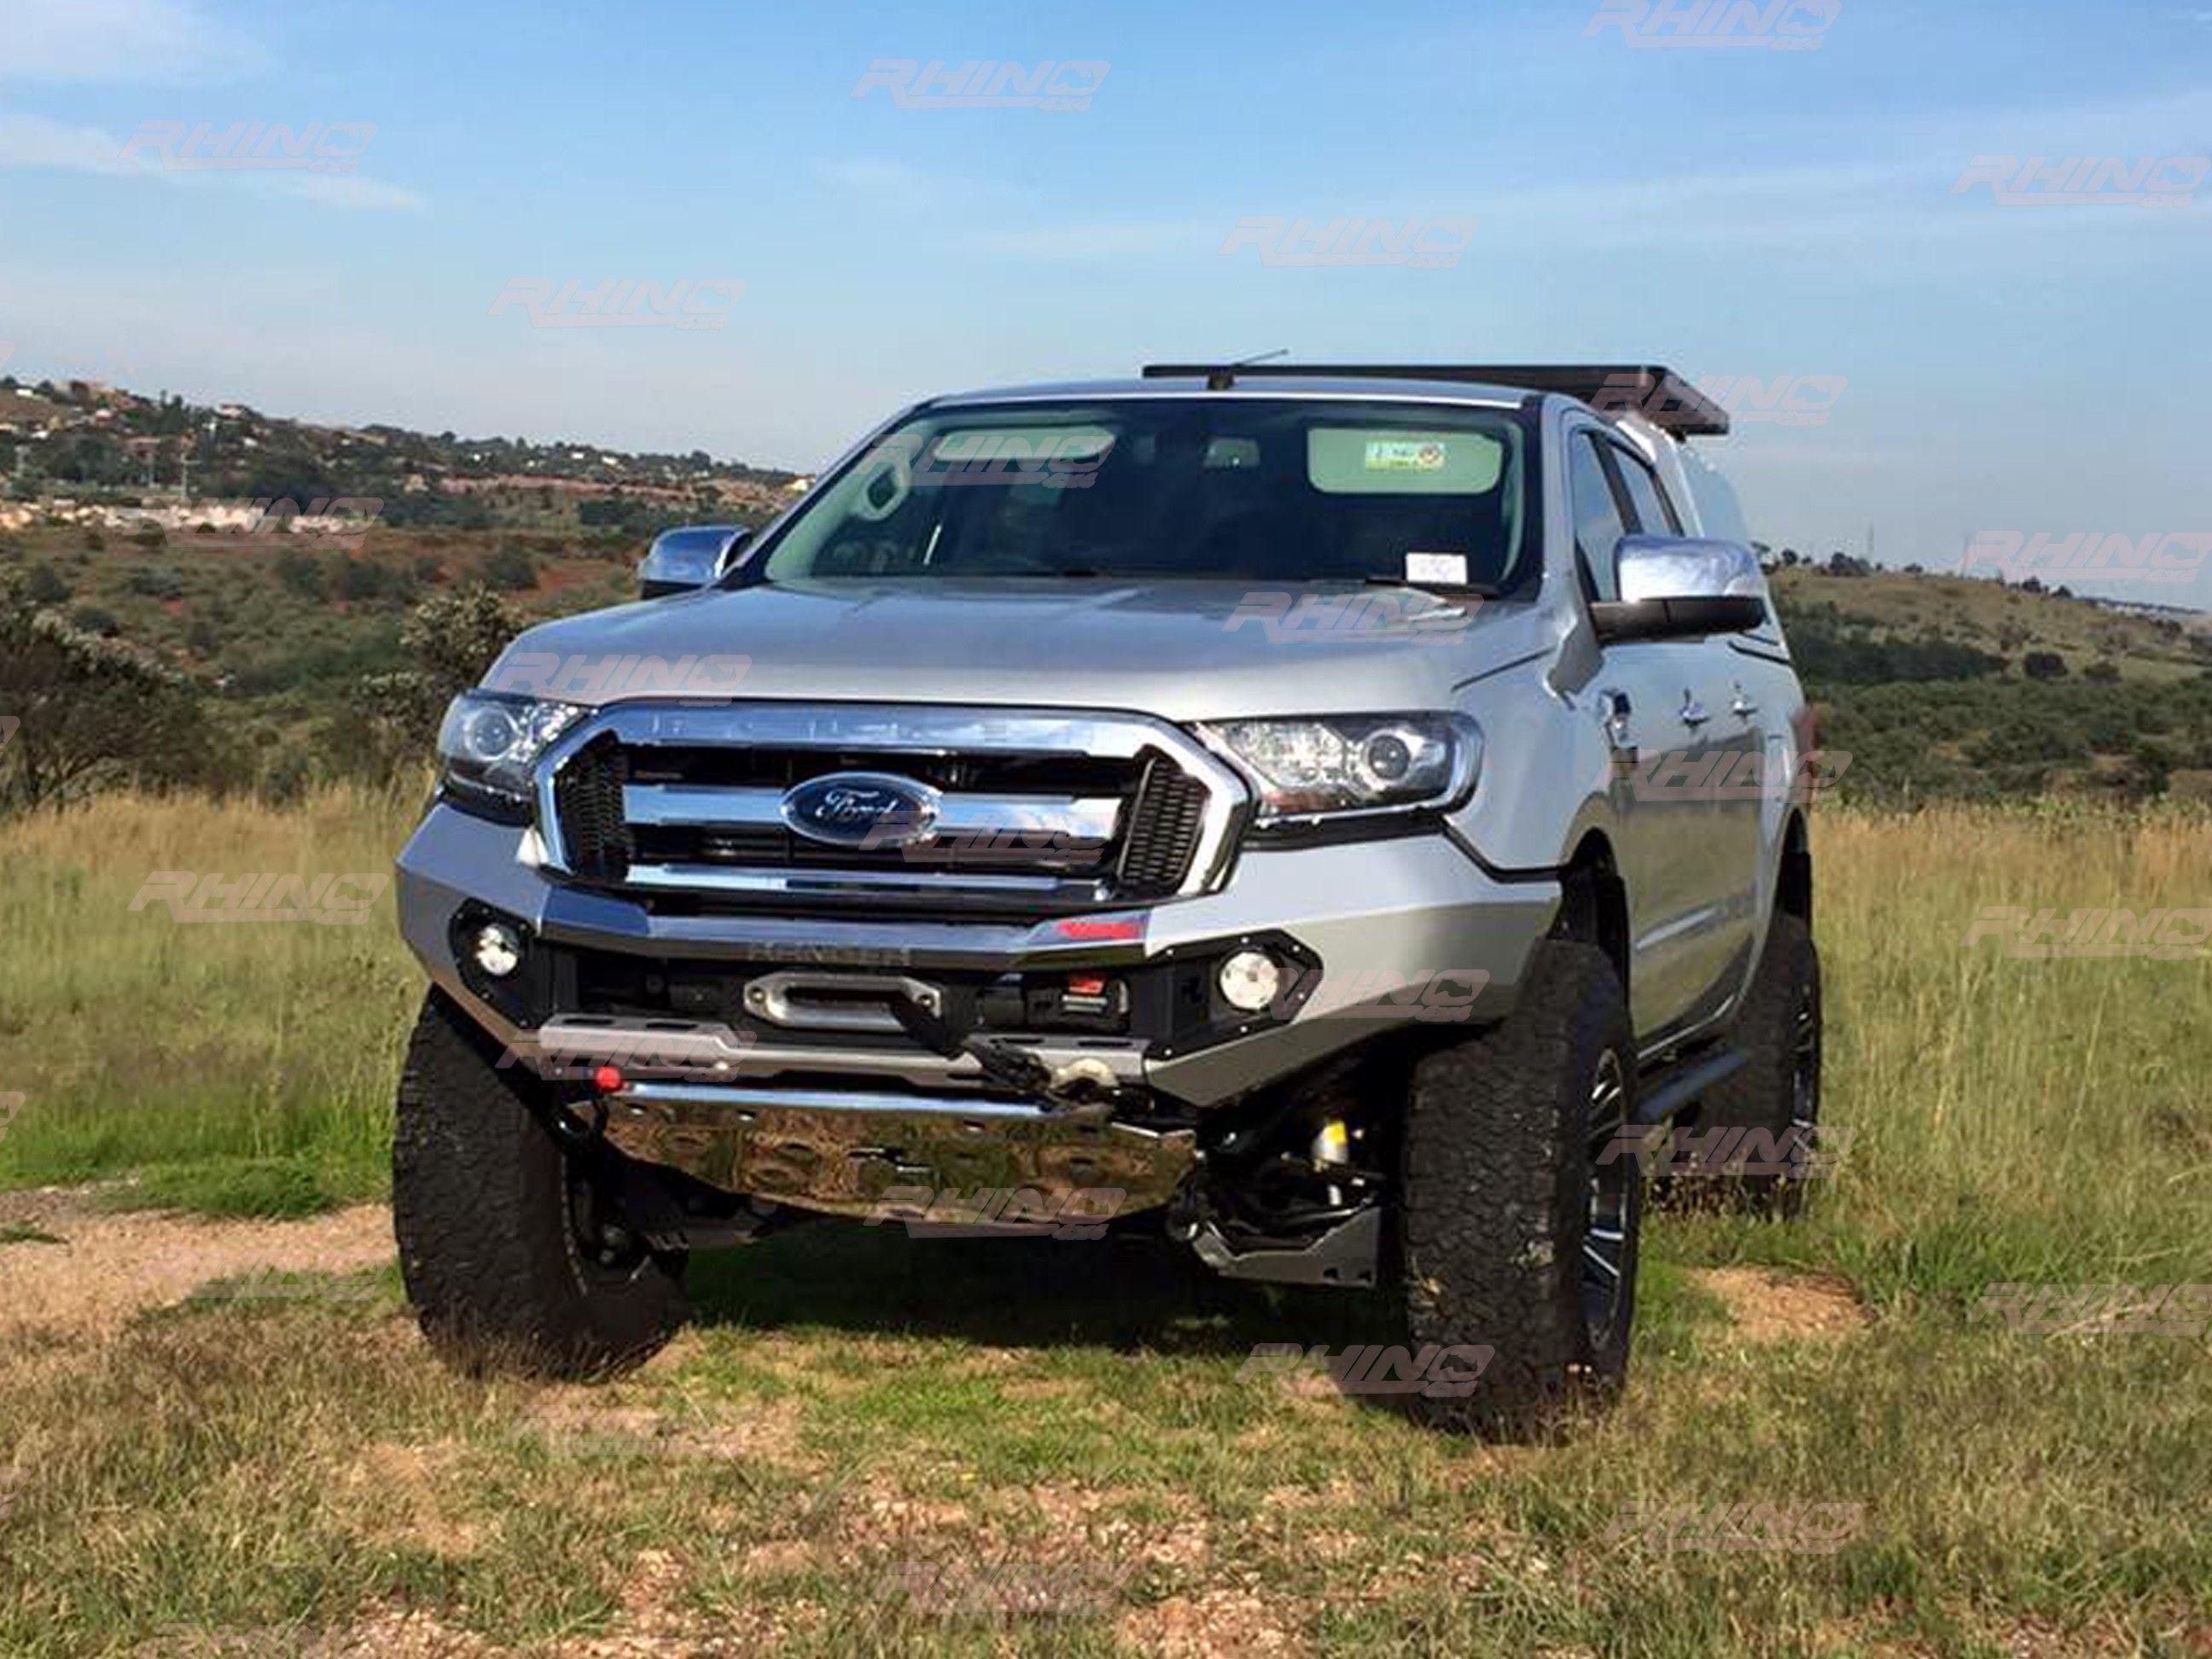 New evolution 3d front bumper for ford ranger t7 2016